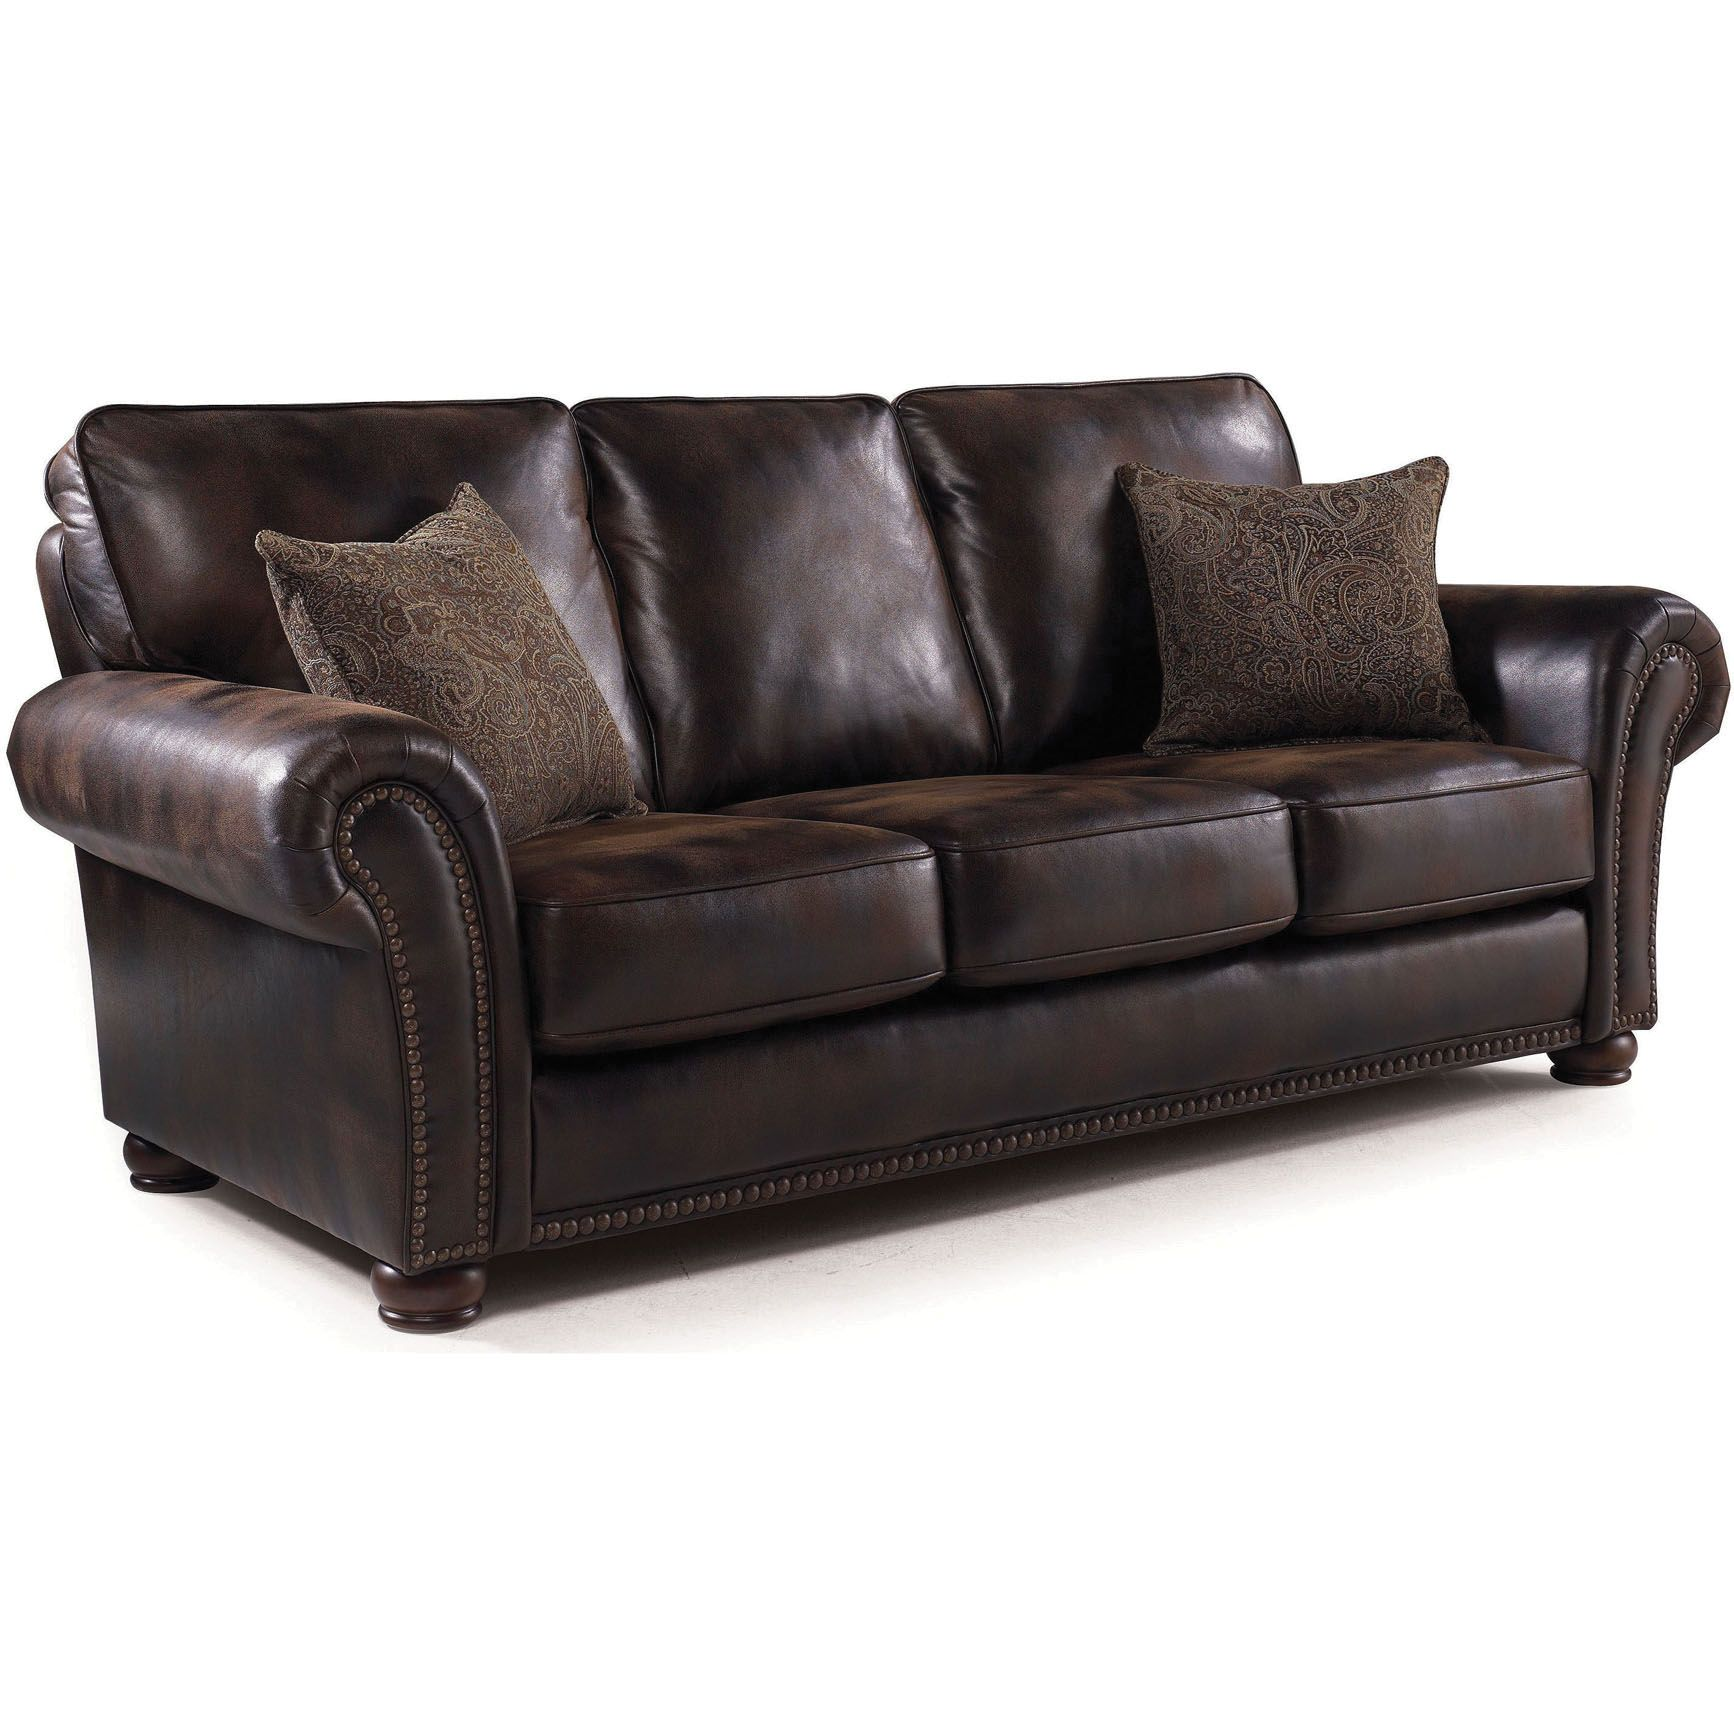 Lane Furniture Benson Queen Sleeper Sofa